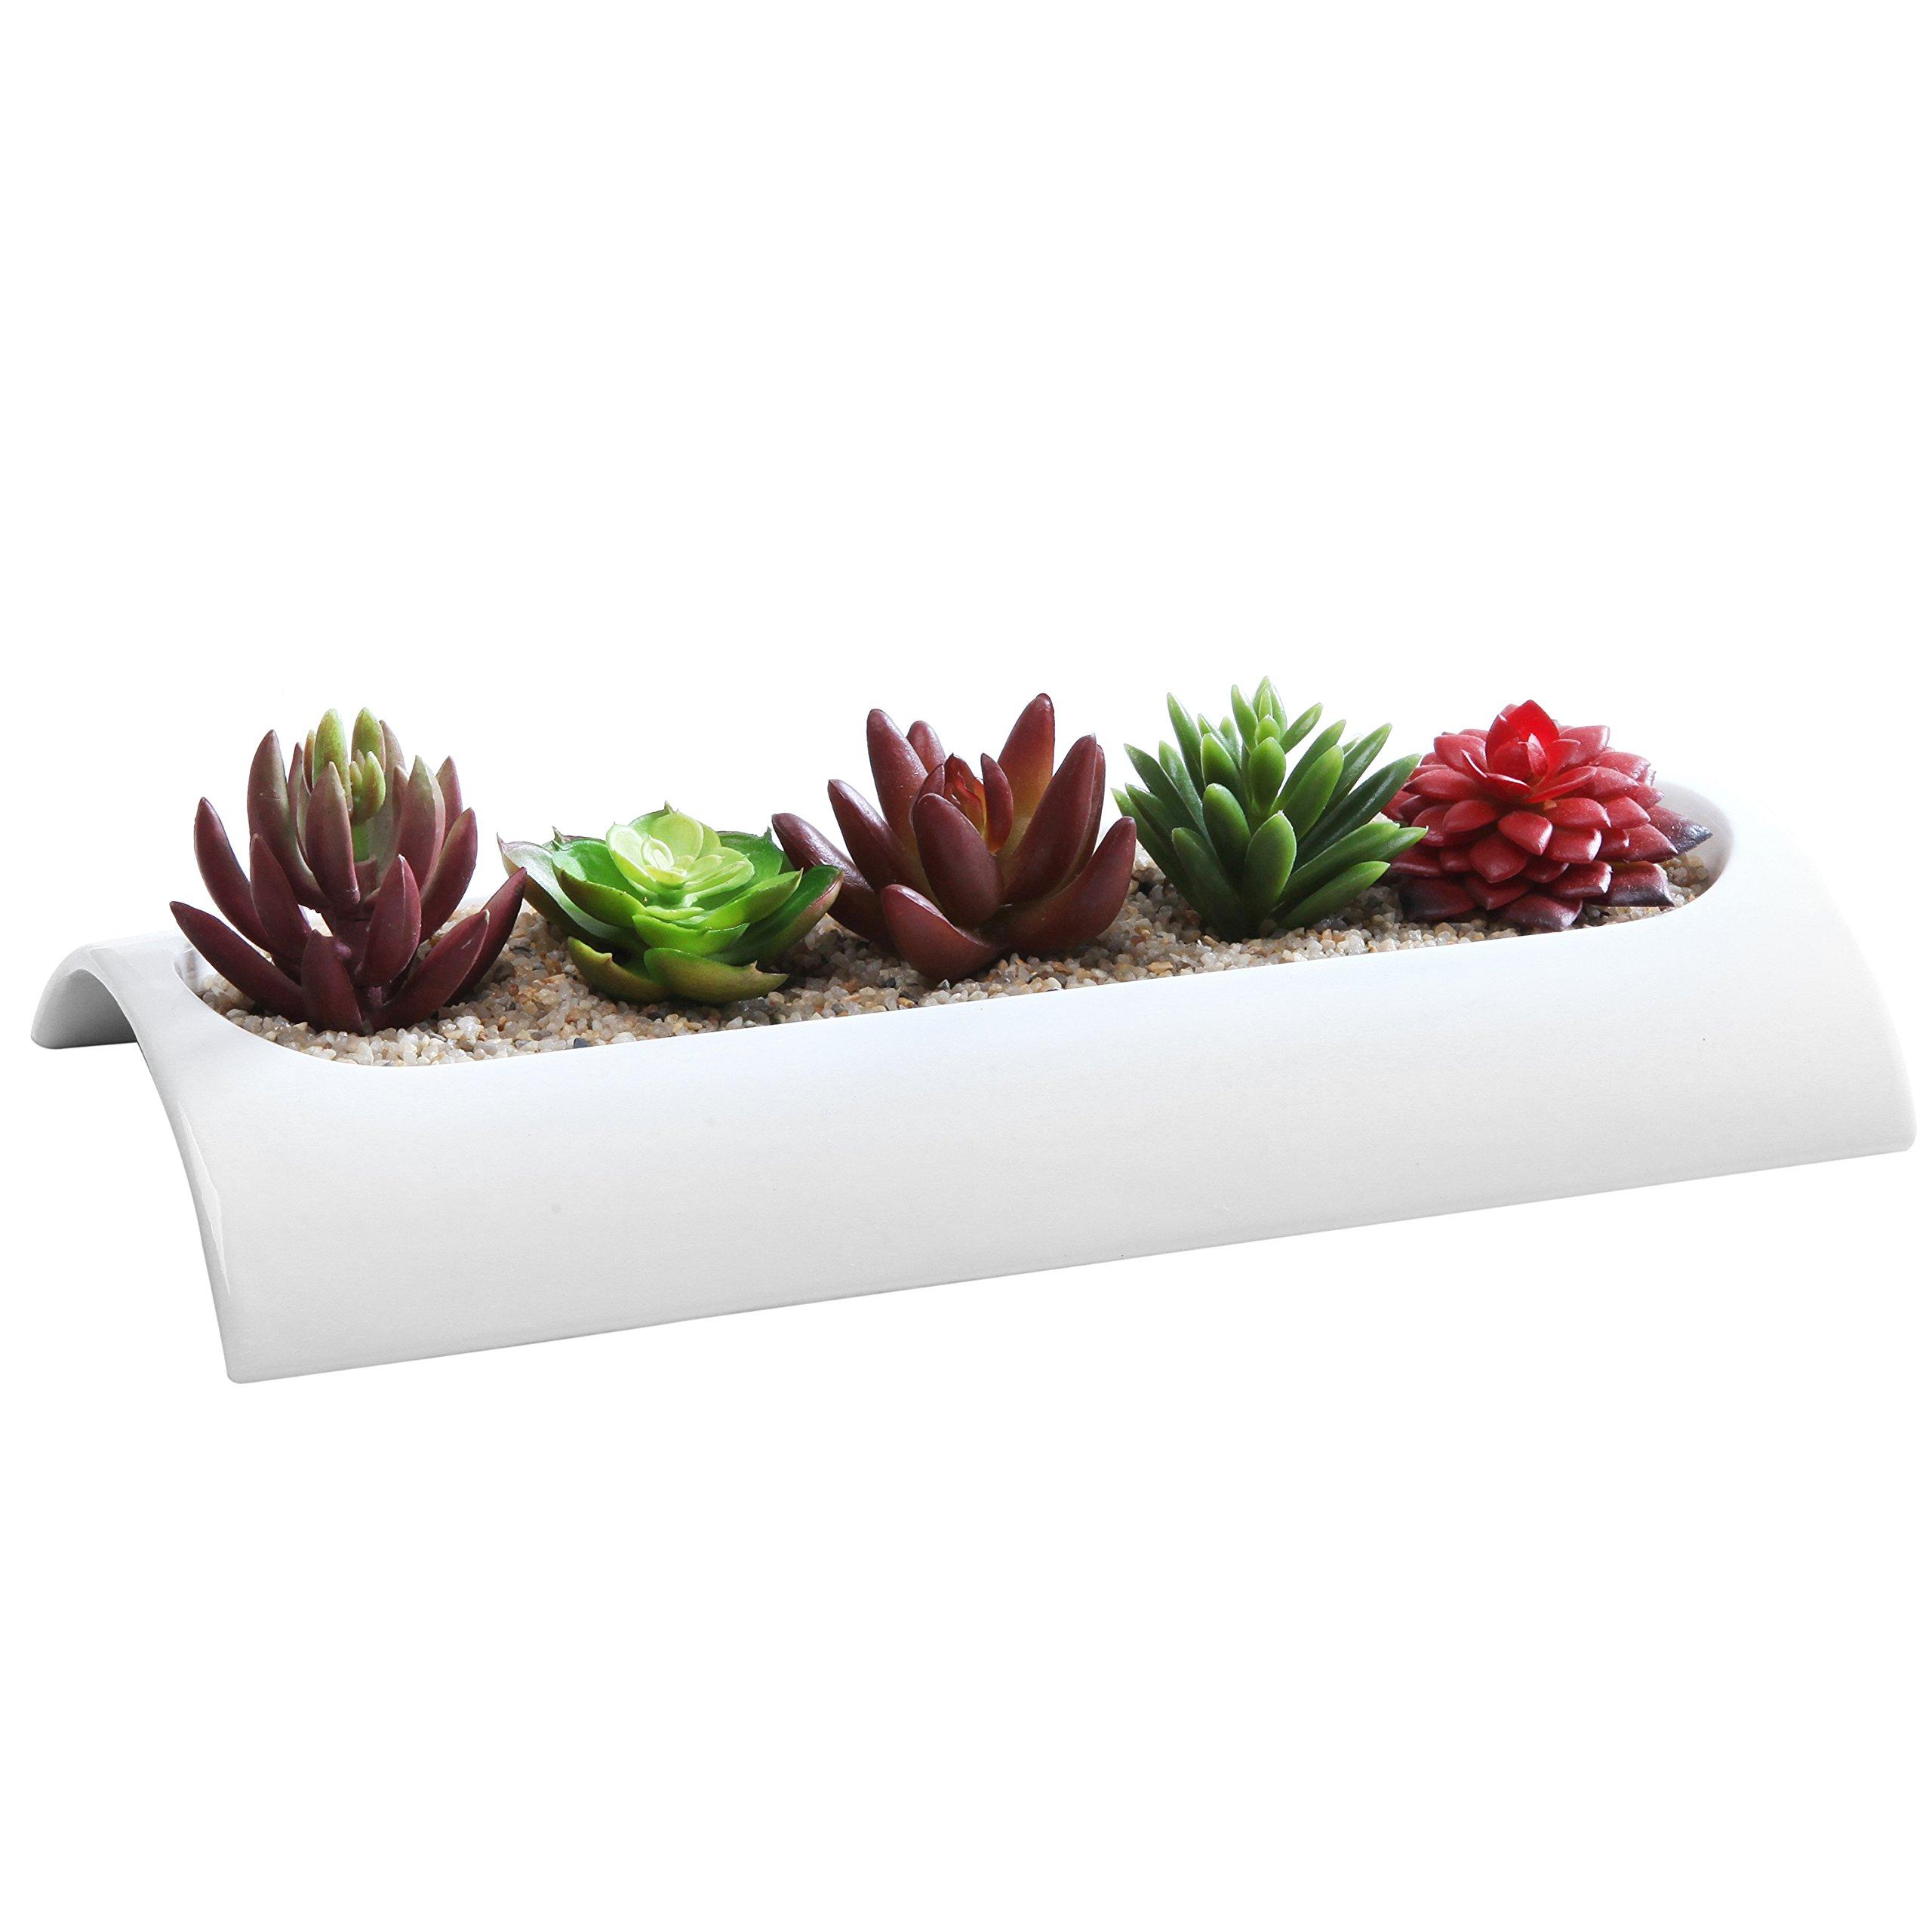 11 X 5 Inch Curved Modern Rectangular Ceramic Flower Dish, Sleek Center Piece Succulent Planter, White by MyGift